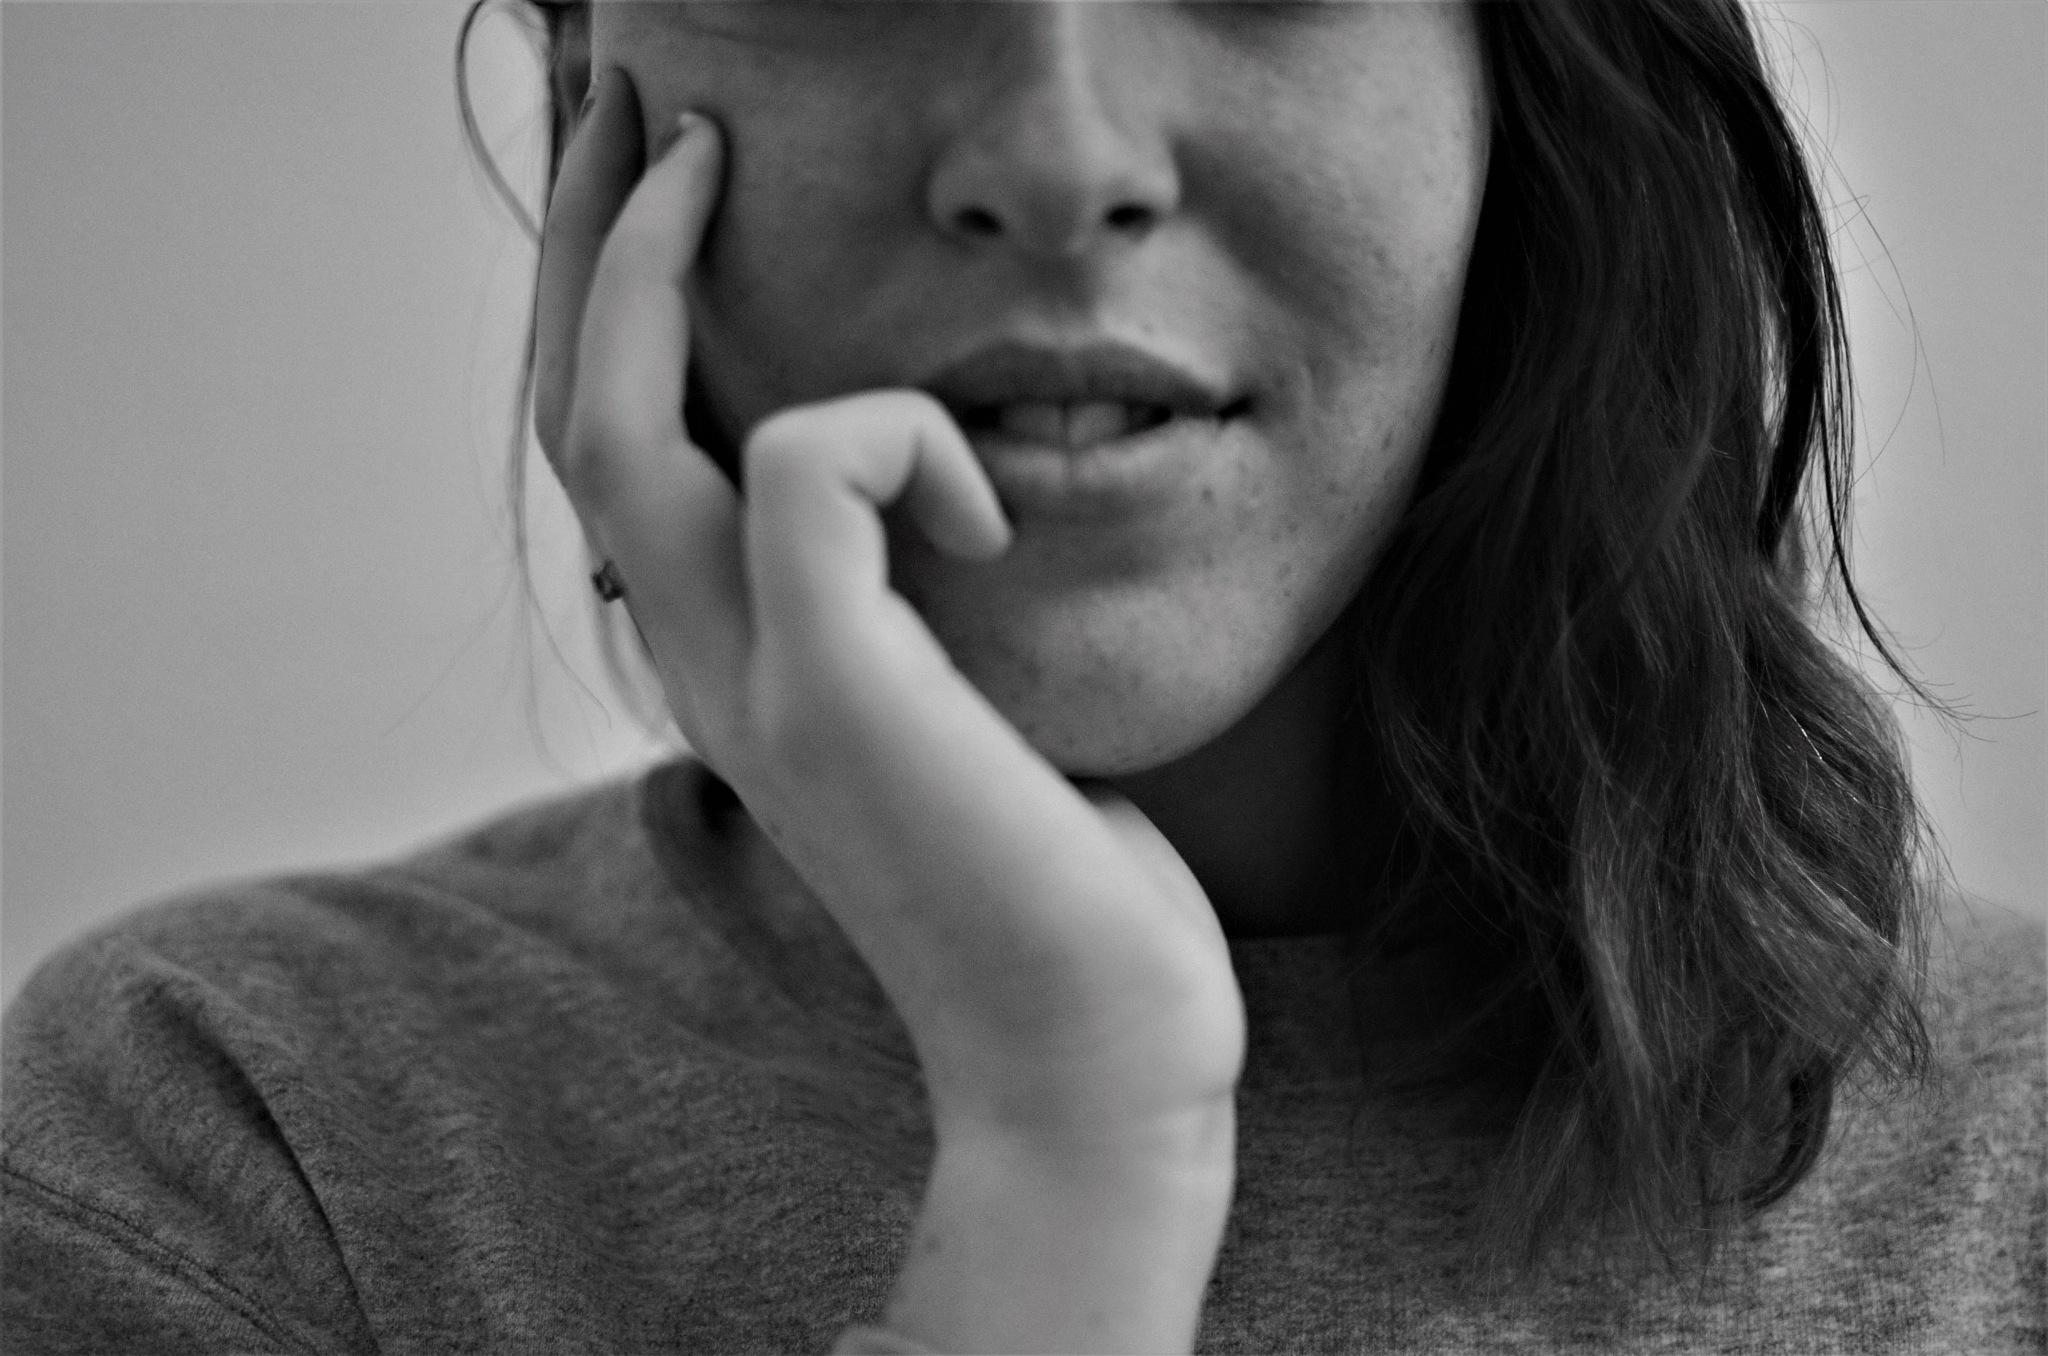 Megan by Fabian Suarez